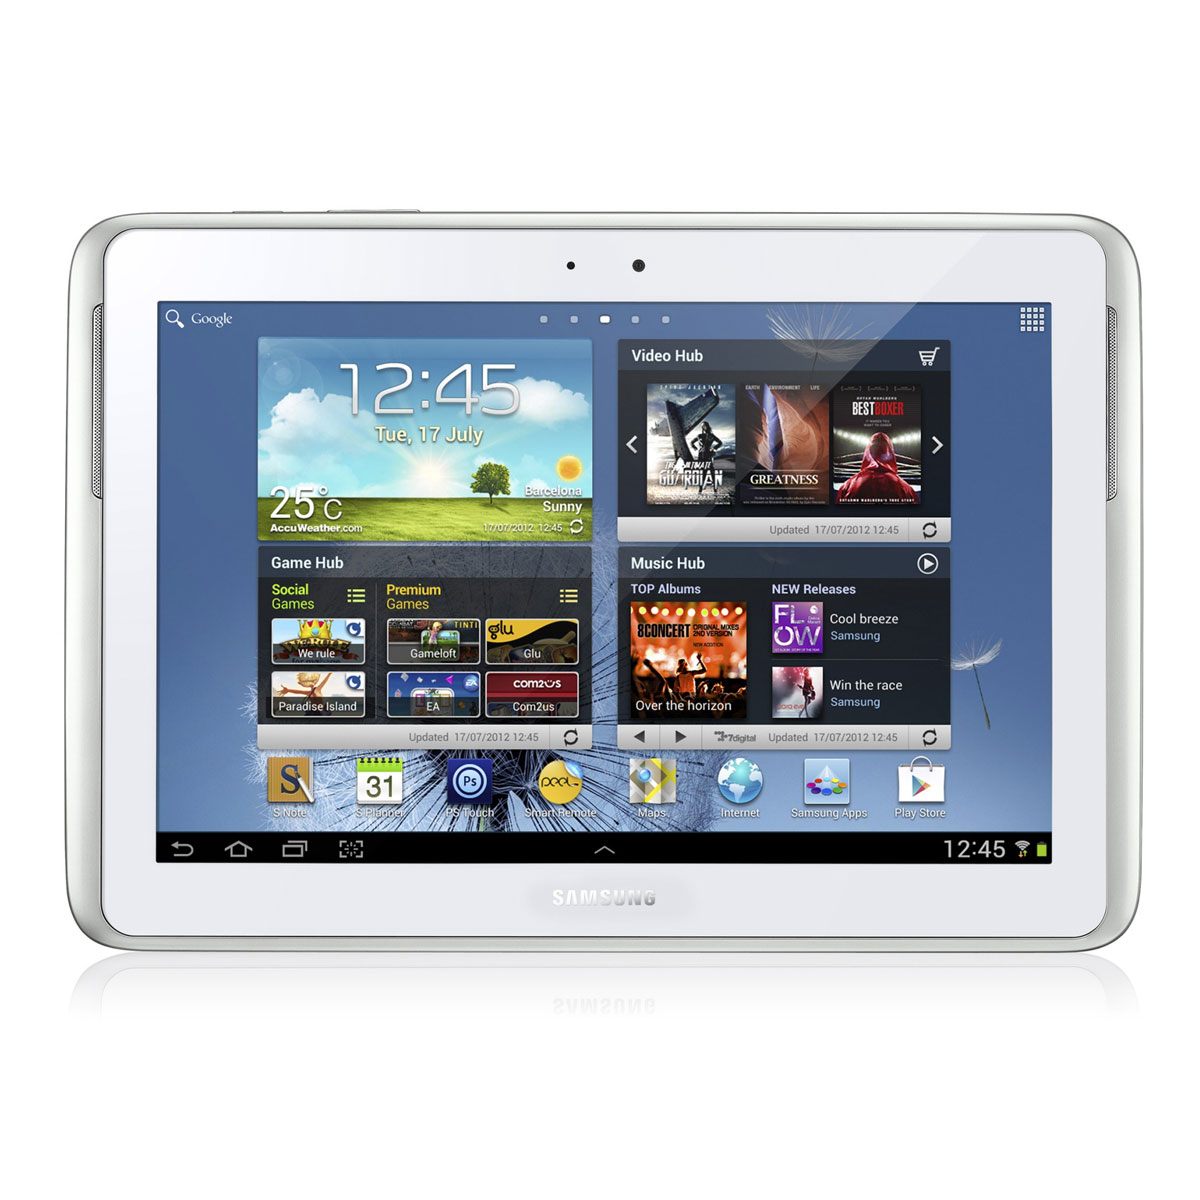 "Tablette tactile Samsung Galaxy Note 10.1 GT-N8000 Blanche 32 Go Tablette 3G/Wi-Fi avec écran tactile 10.1"" sous Android 4.0"